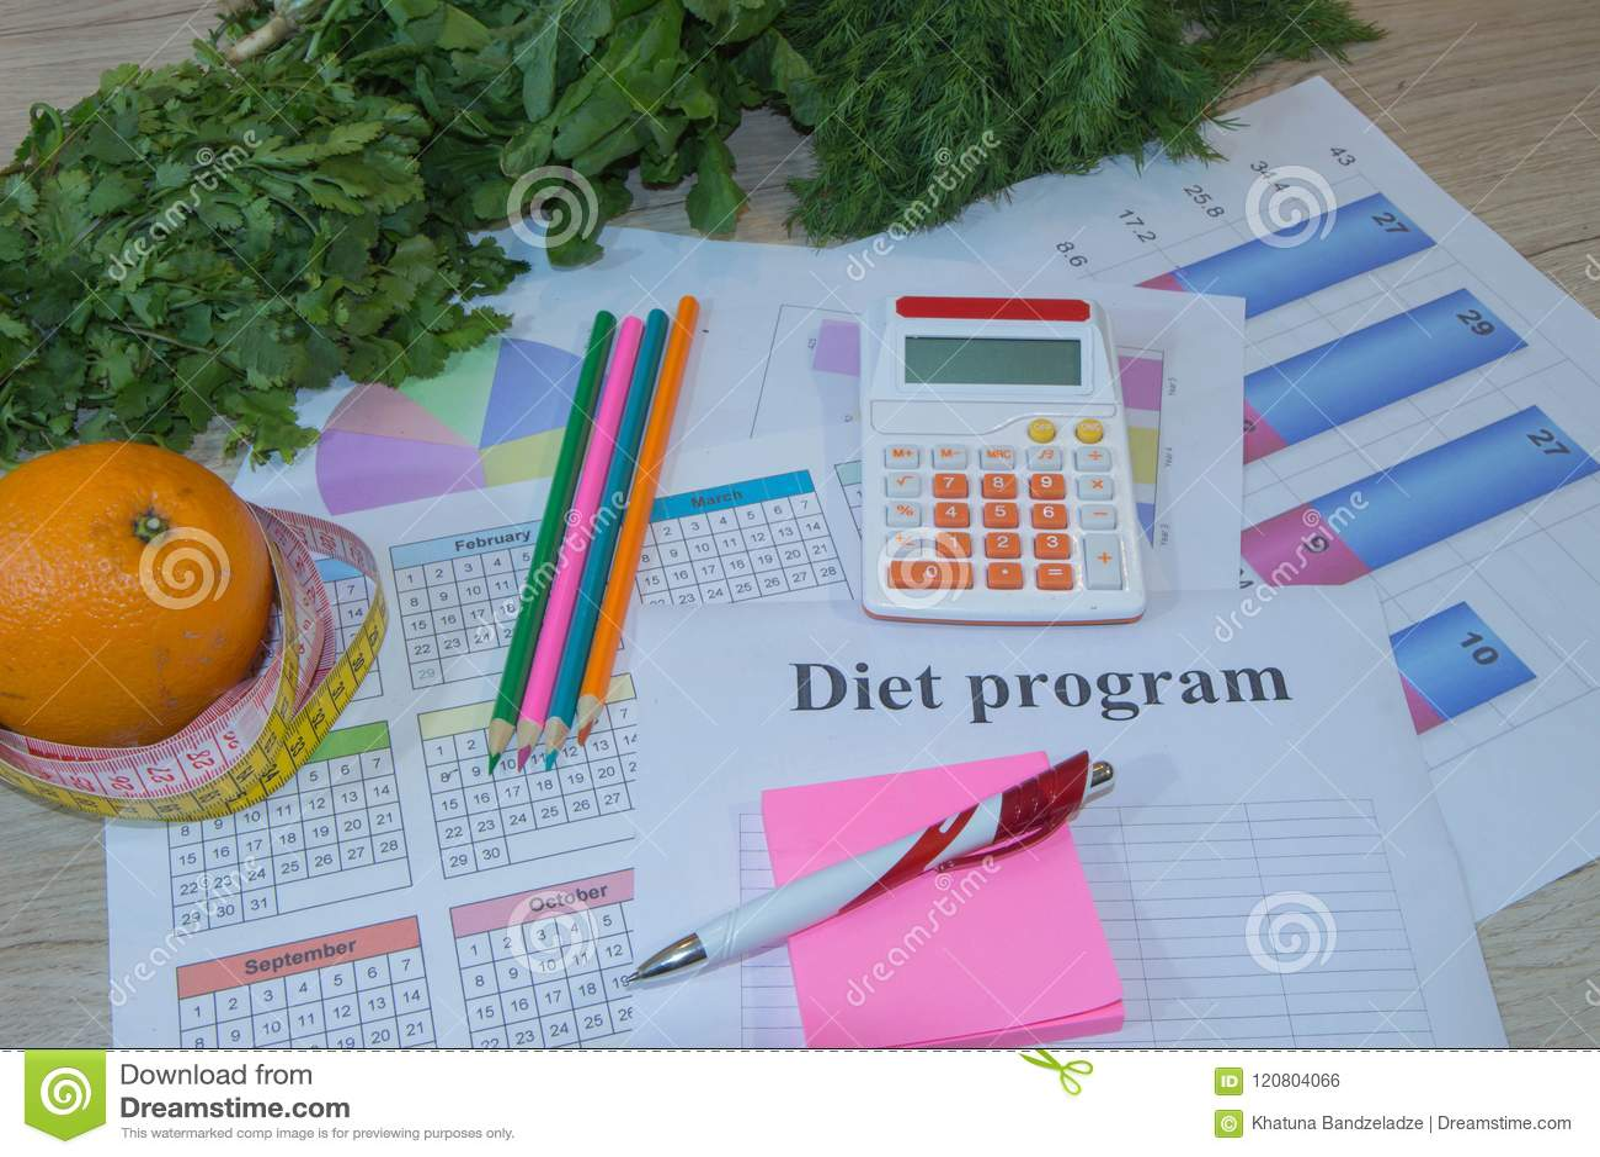 dieta de control de peso